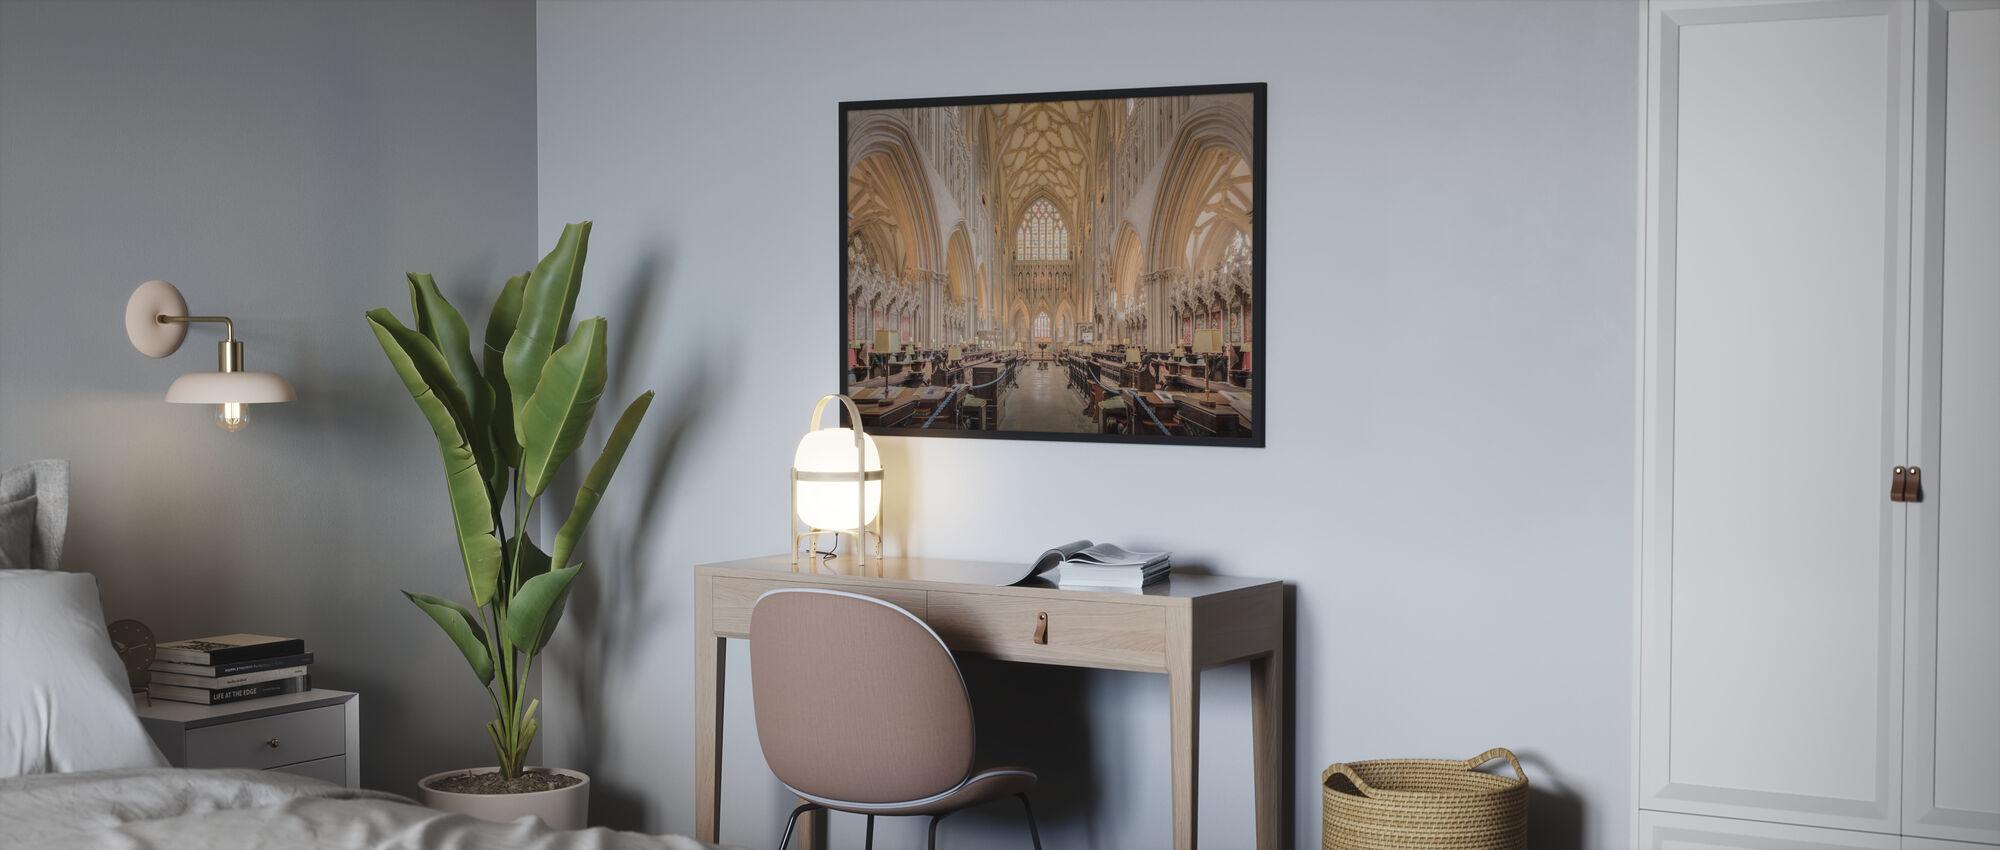 Choir Church Room - Poster - Bedroom